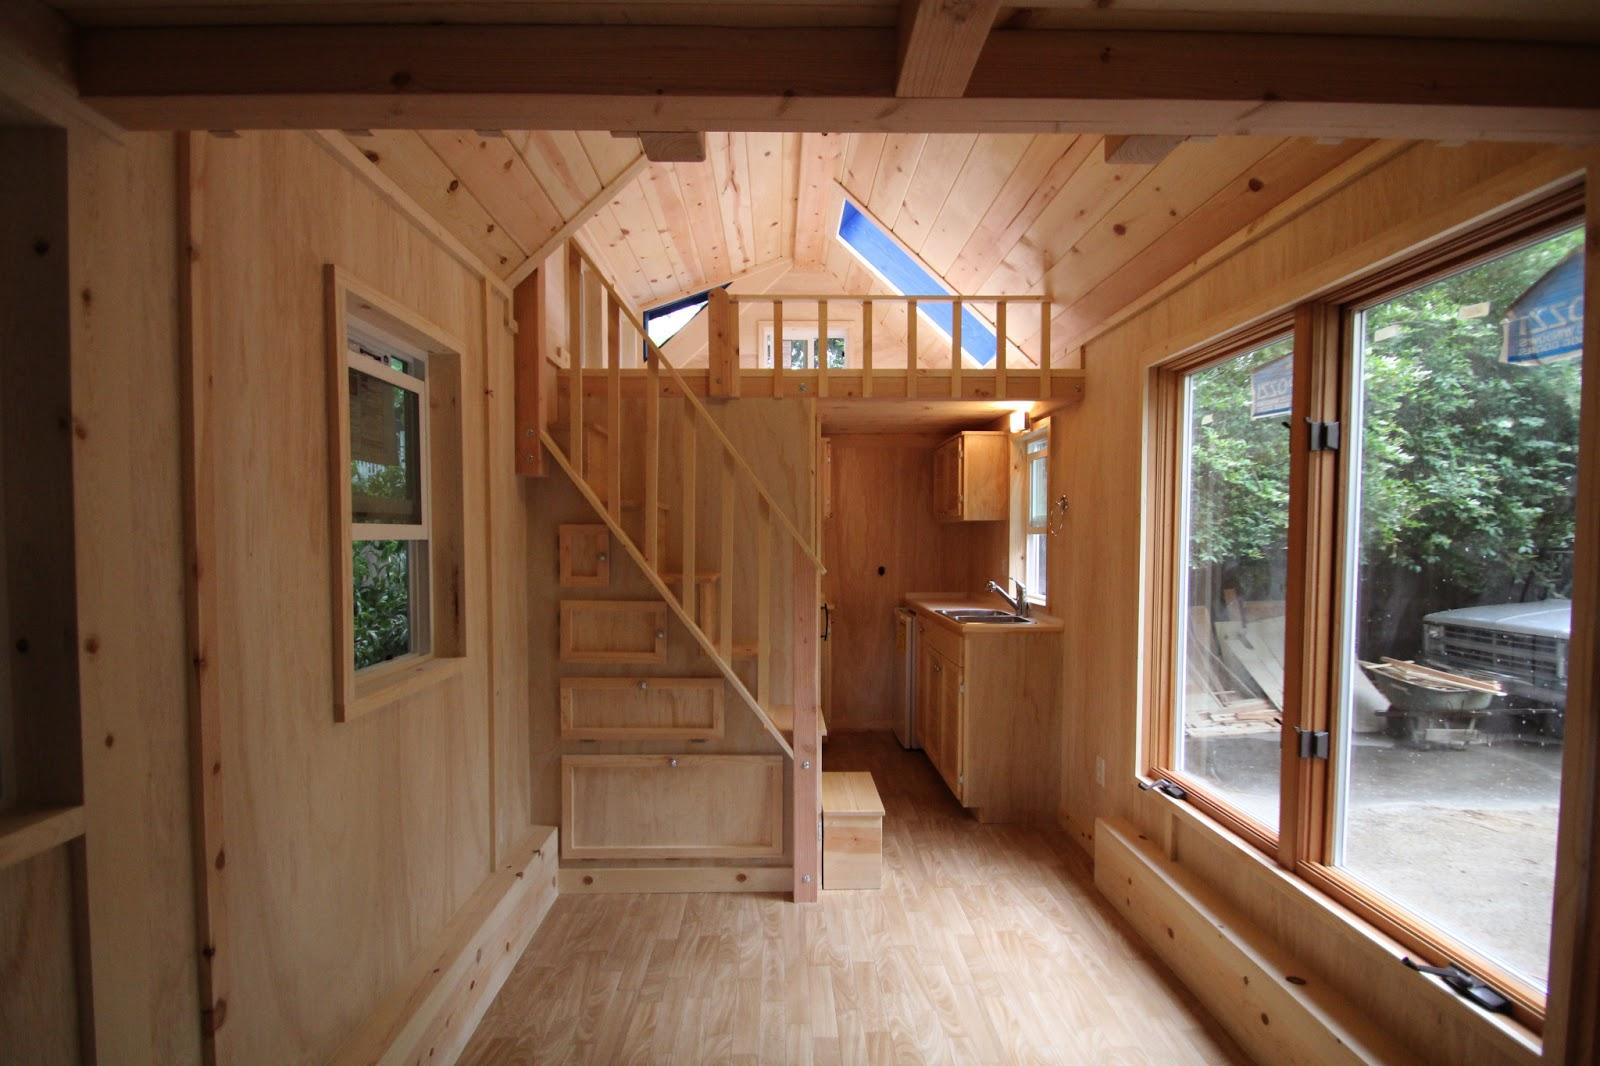 molecule tiny homes new house tour requisitely blas. Black Bedroom Furniture Sets. Home Design Ideas